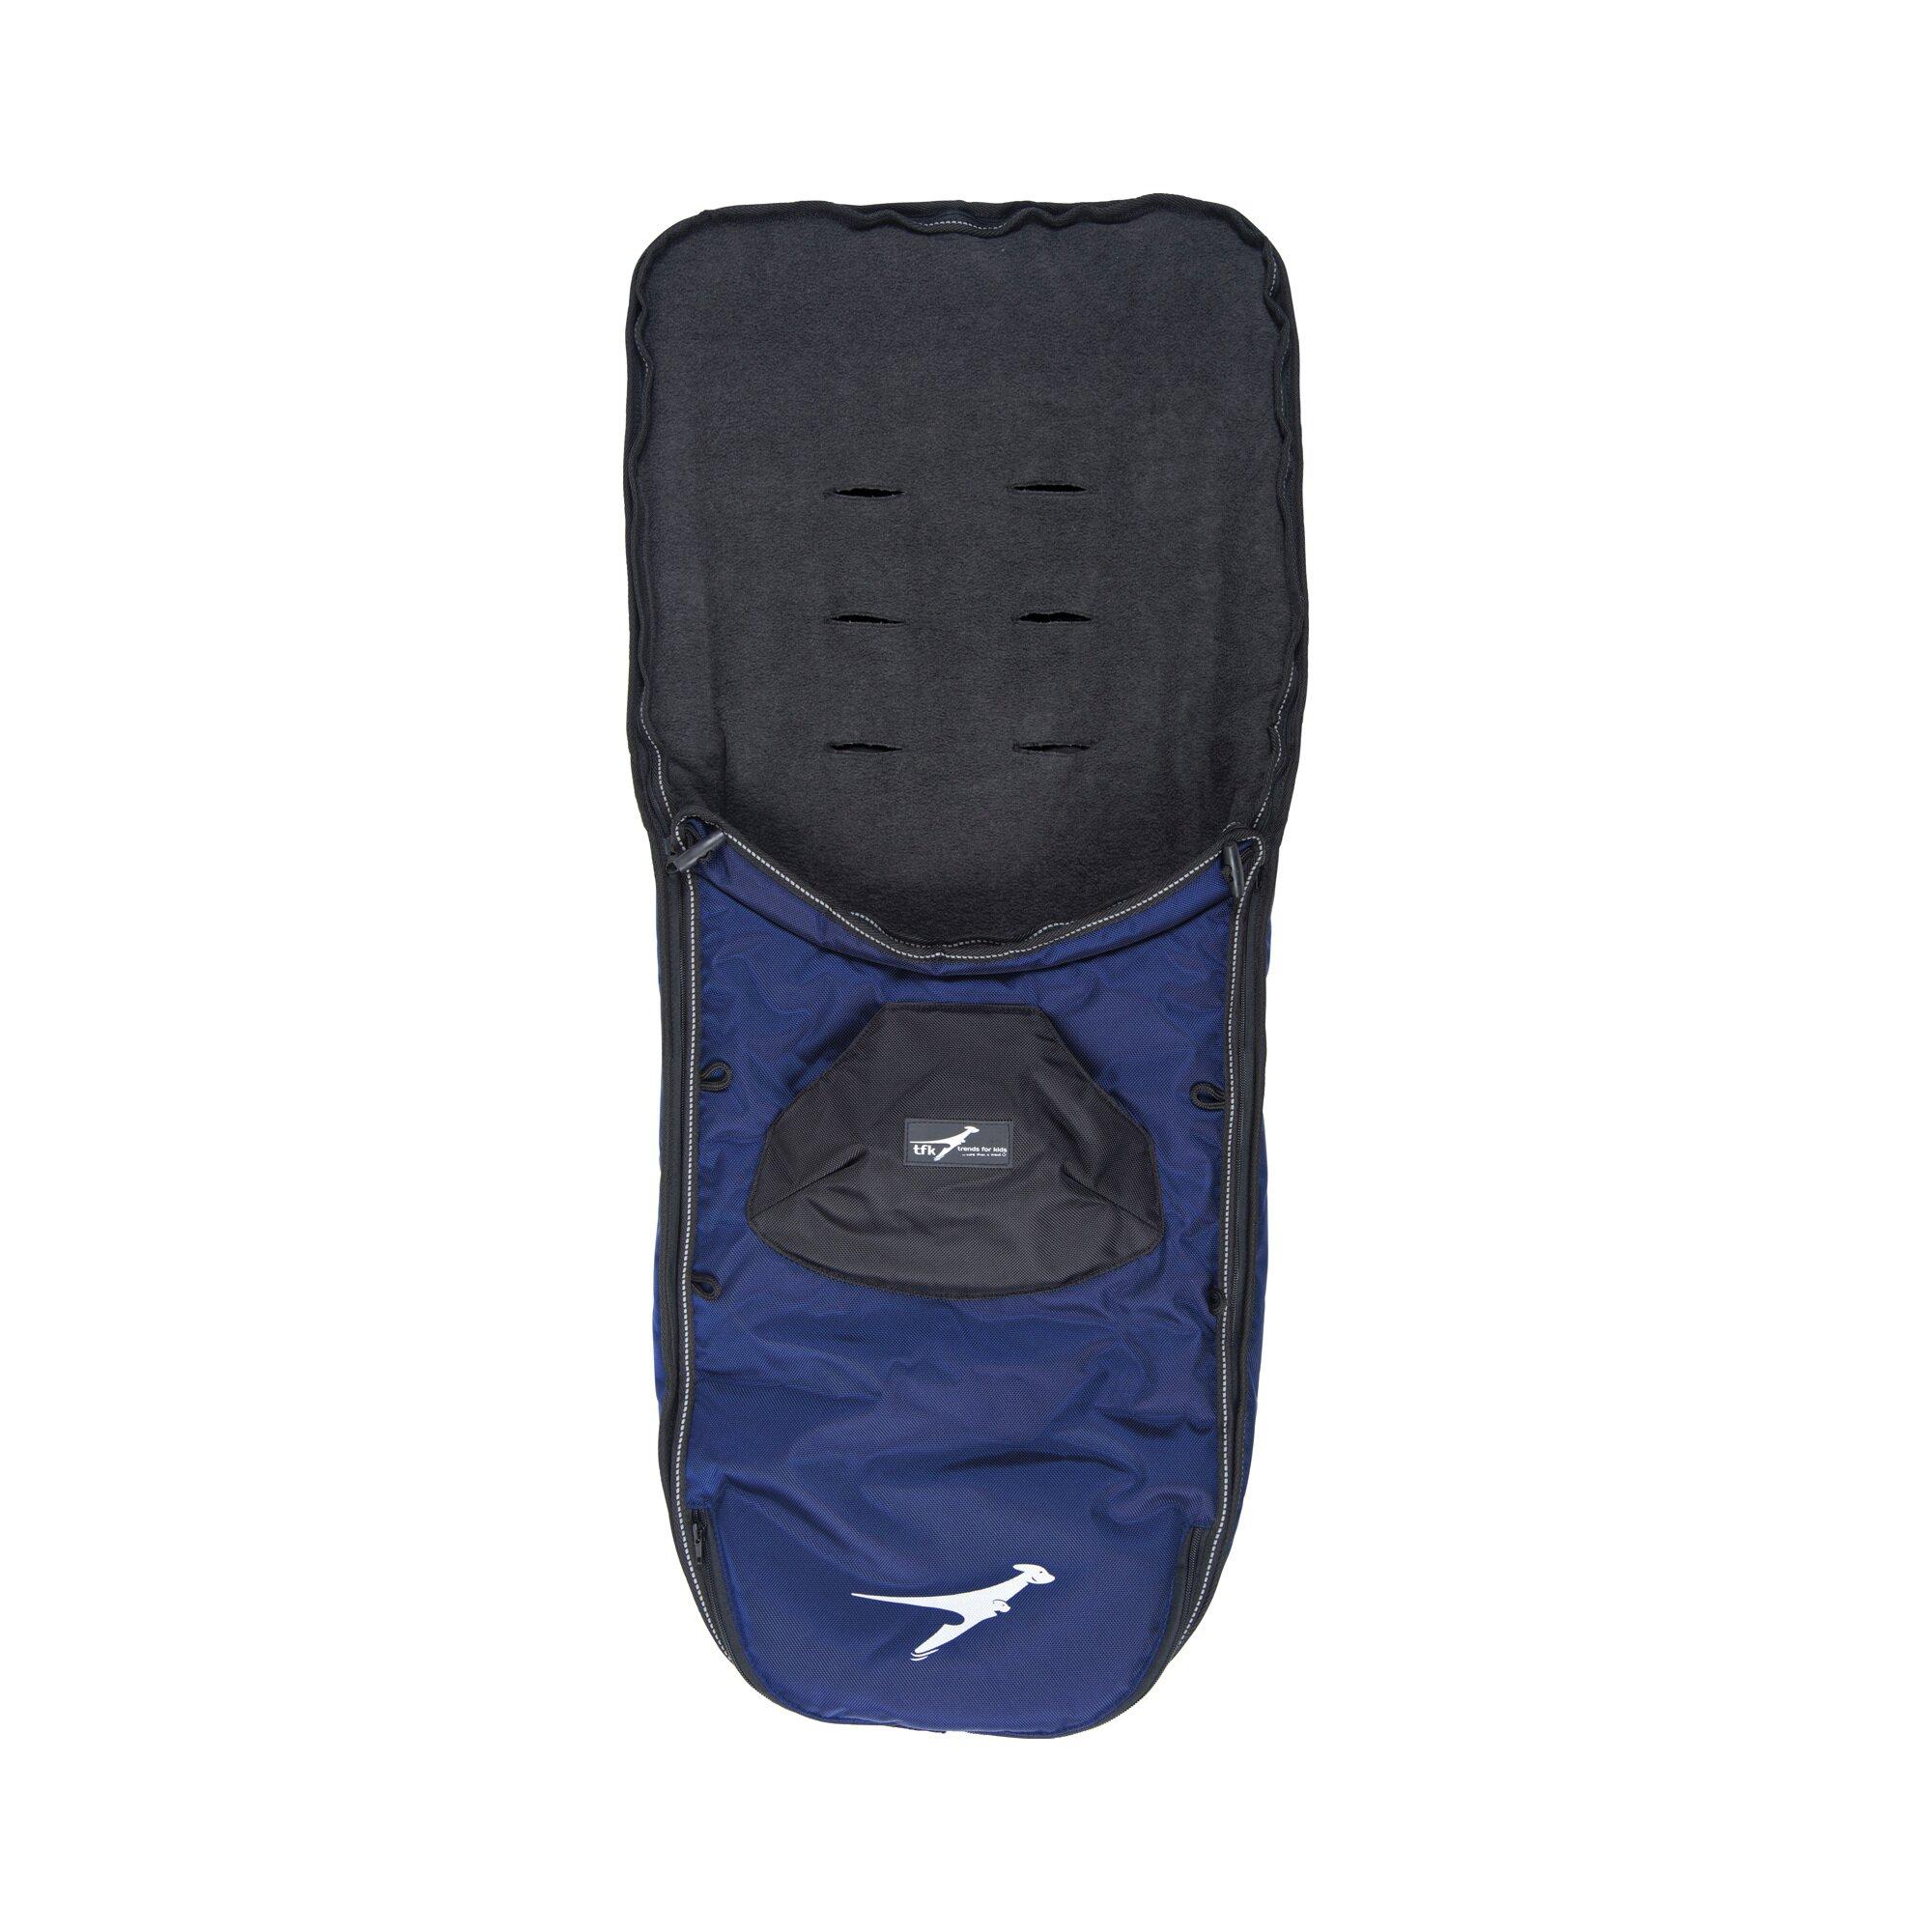 Tfk Winter-Fußsack für Kinderwagen Sportwagen Joggster III, Joggster Twist, Twinner Twist, Buggster S, Joggster X, X II blau